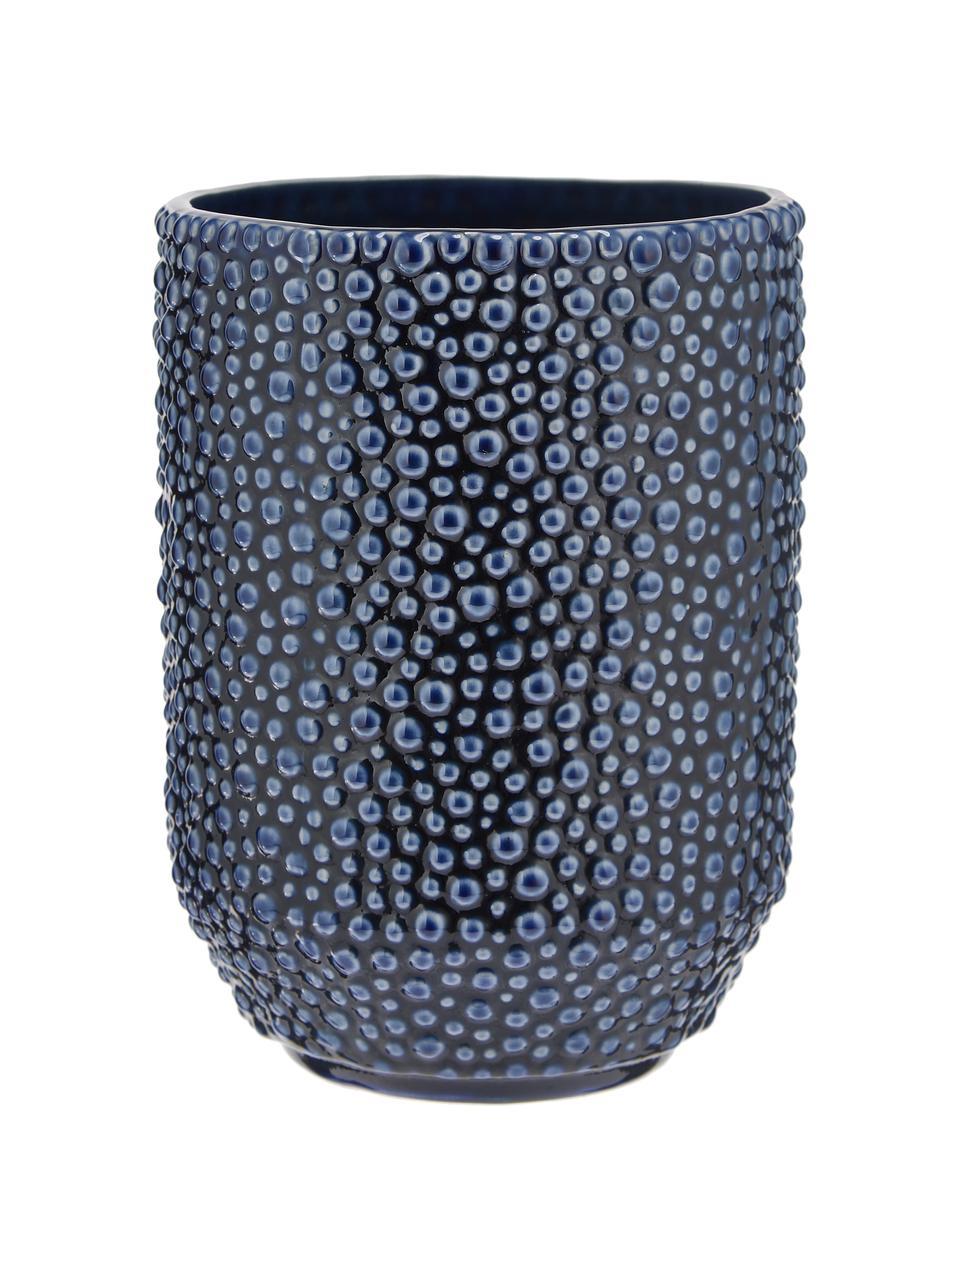 Keramik-Vase Ozean, Keramik, Blau, Ø 15 x H 21 cm